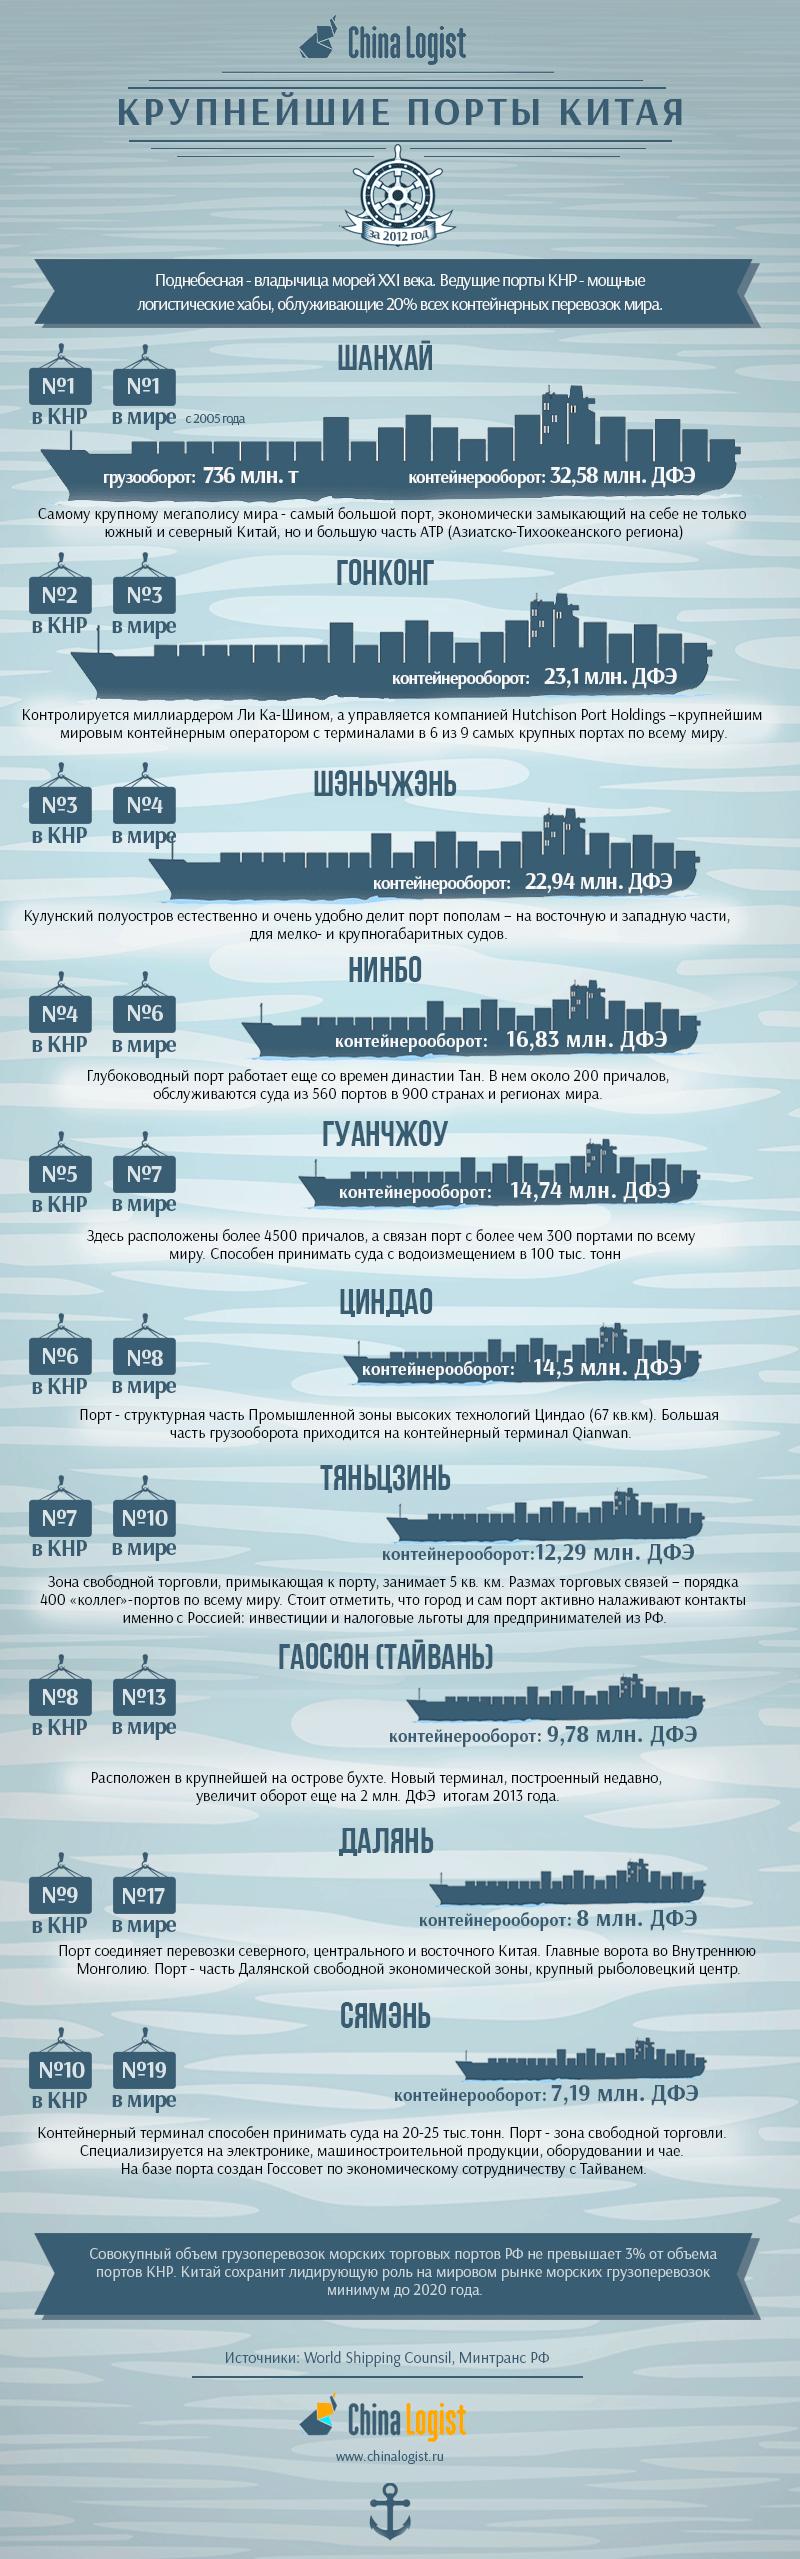 Доставка грузов Владивосток  служба экспресс доставки